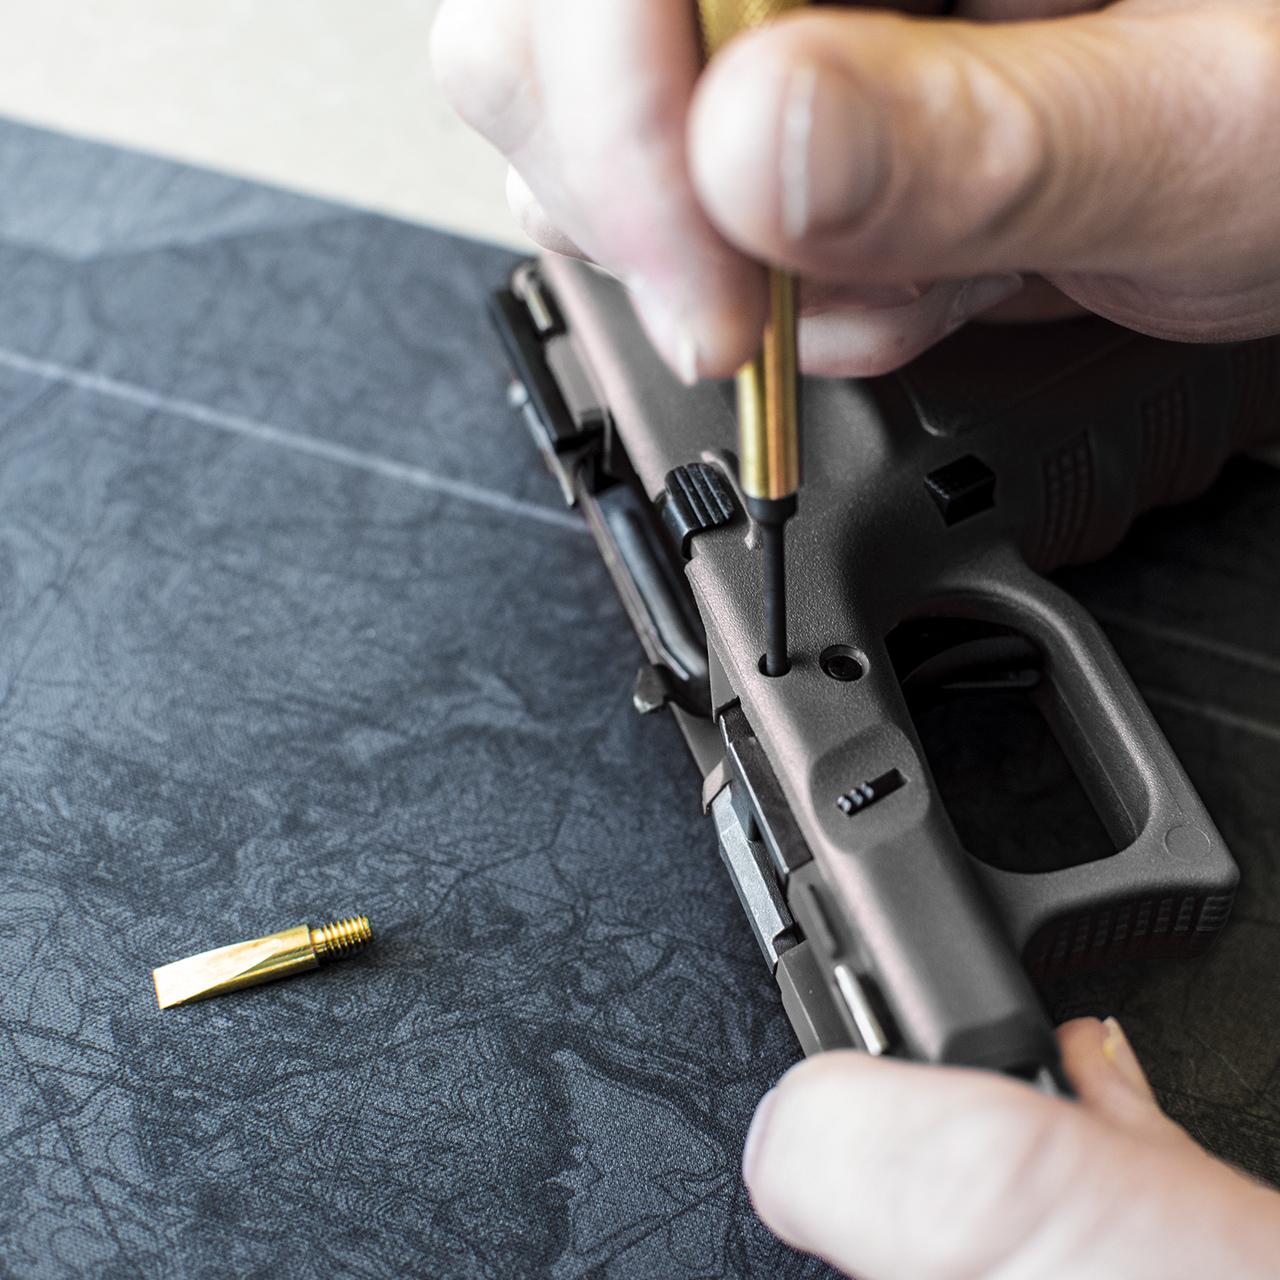 Armorer's Pistol Tool